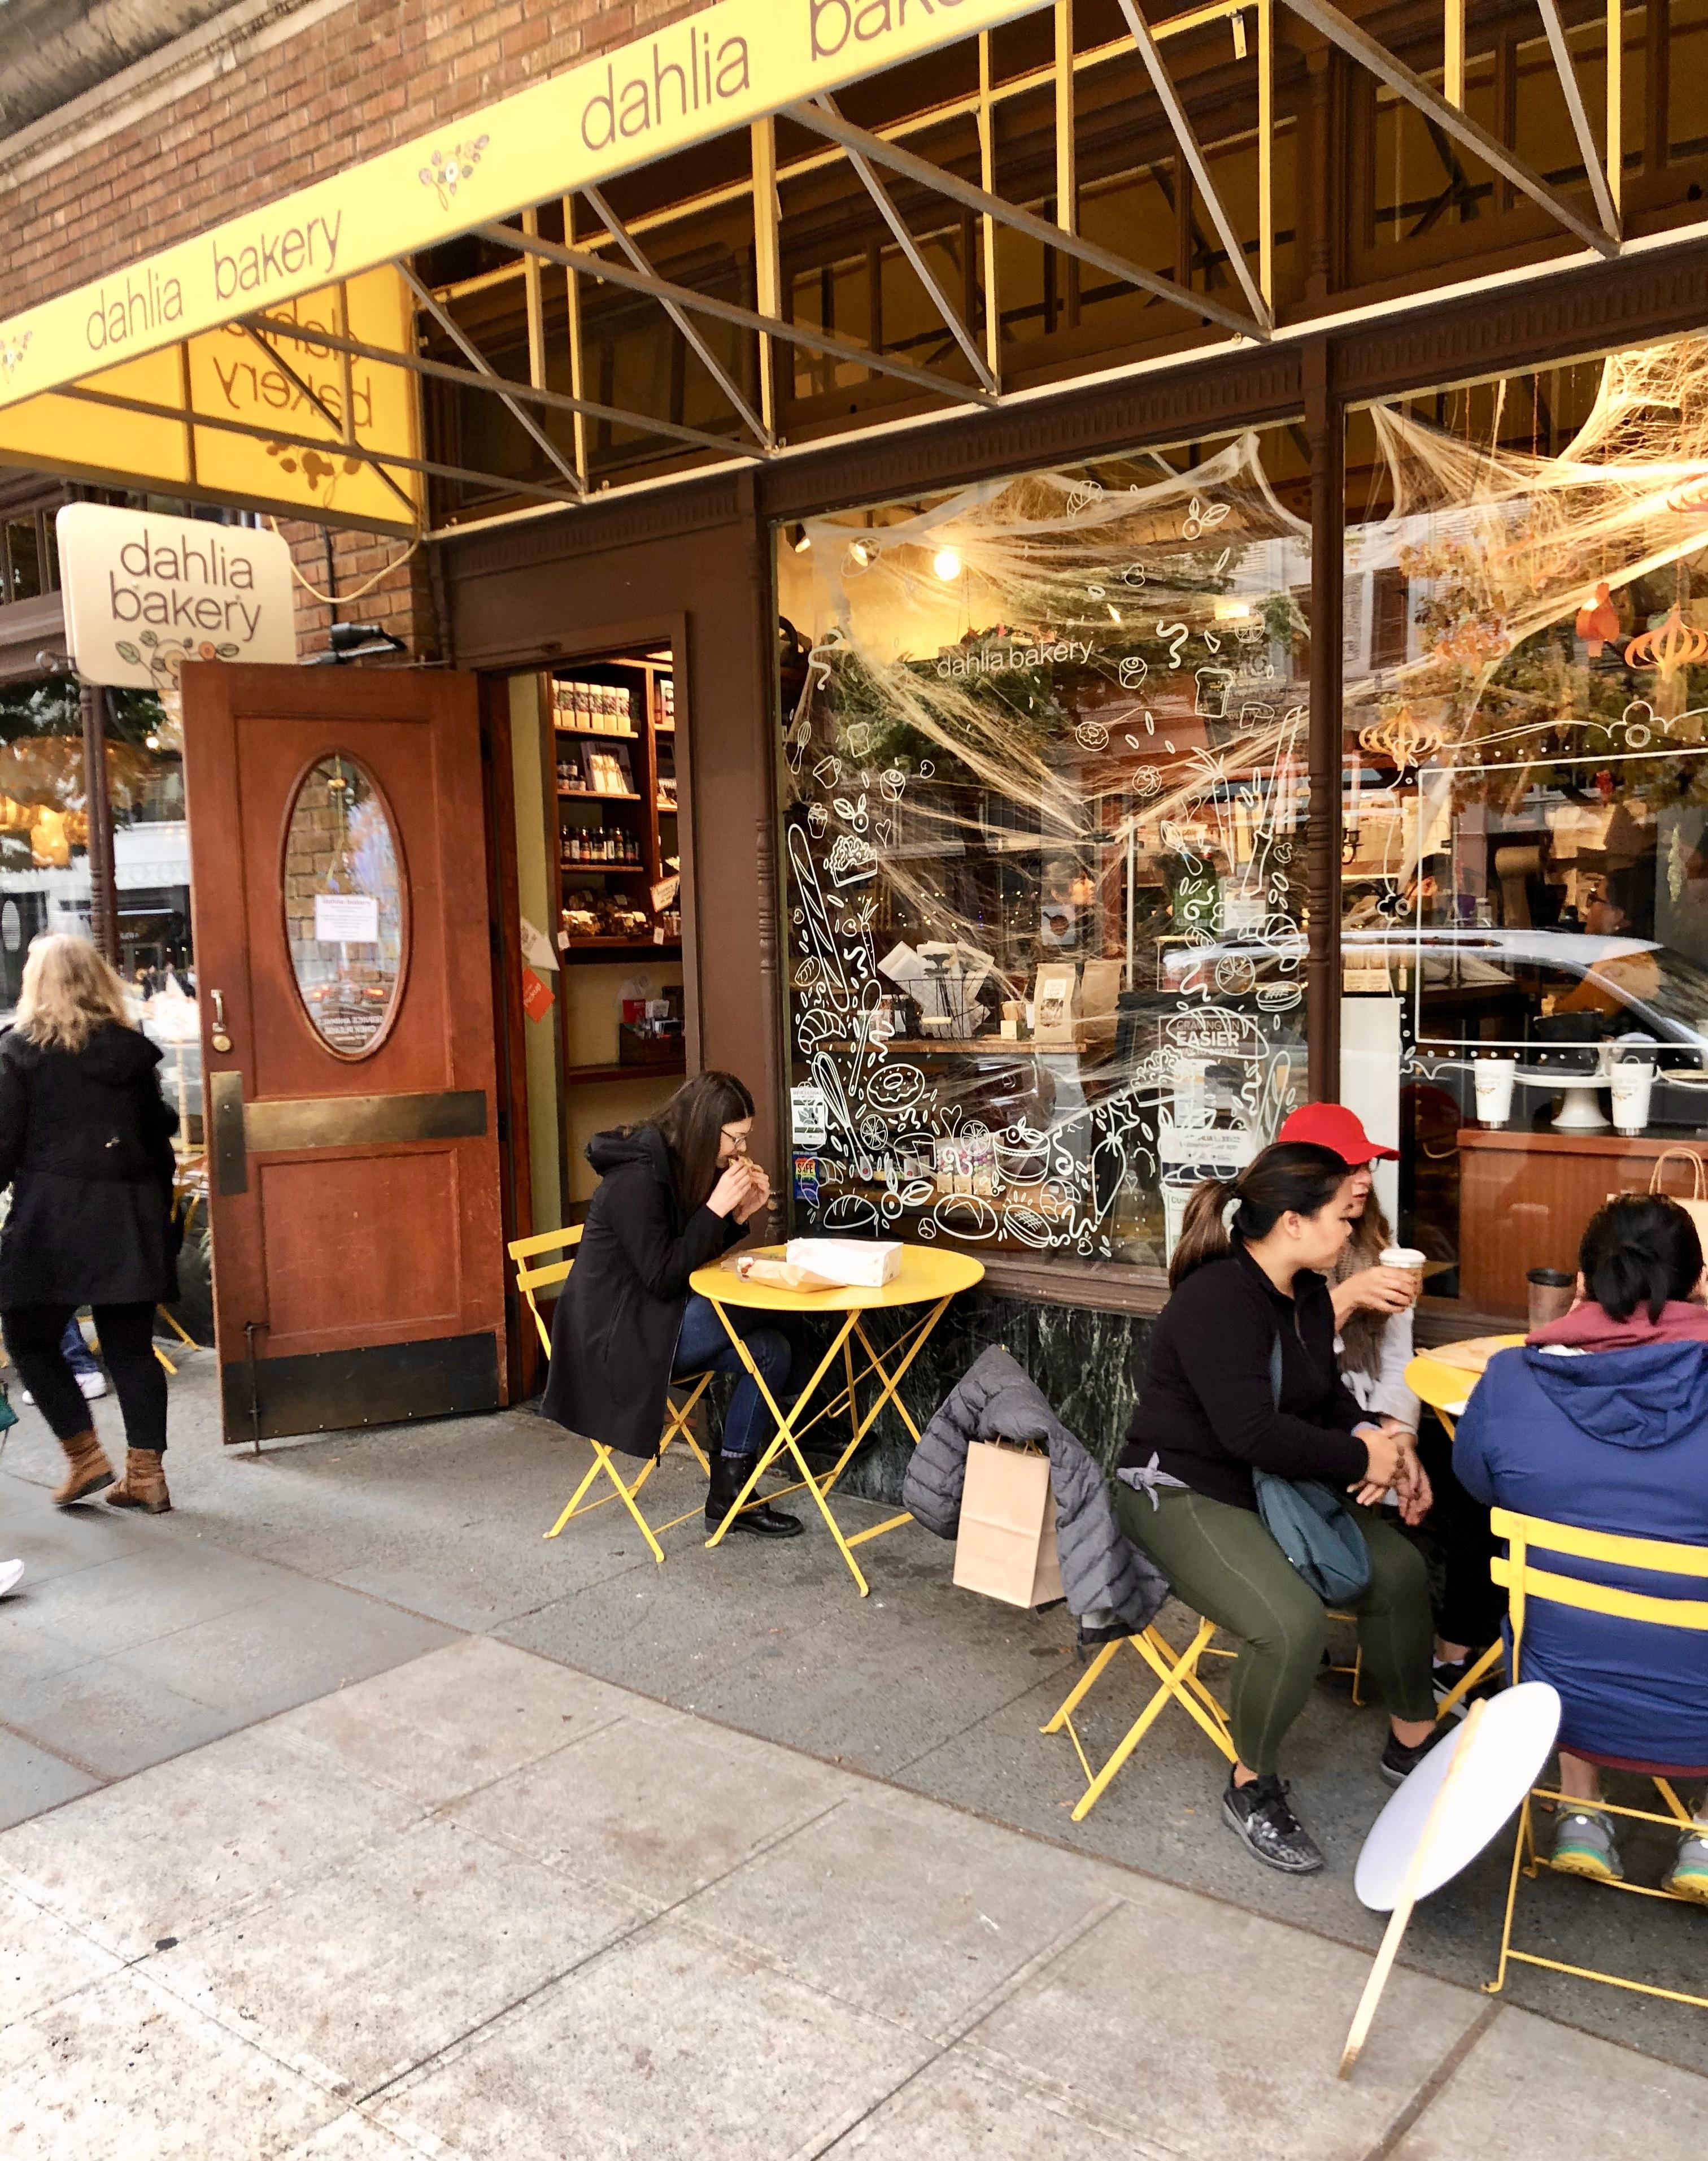 Dahlia Bakery Seattle